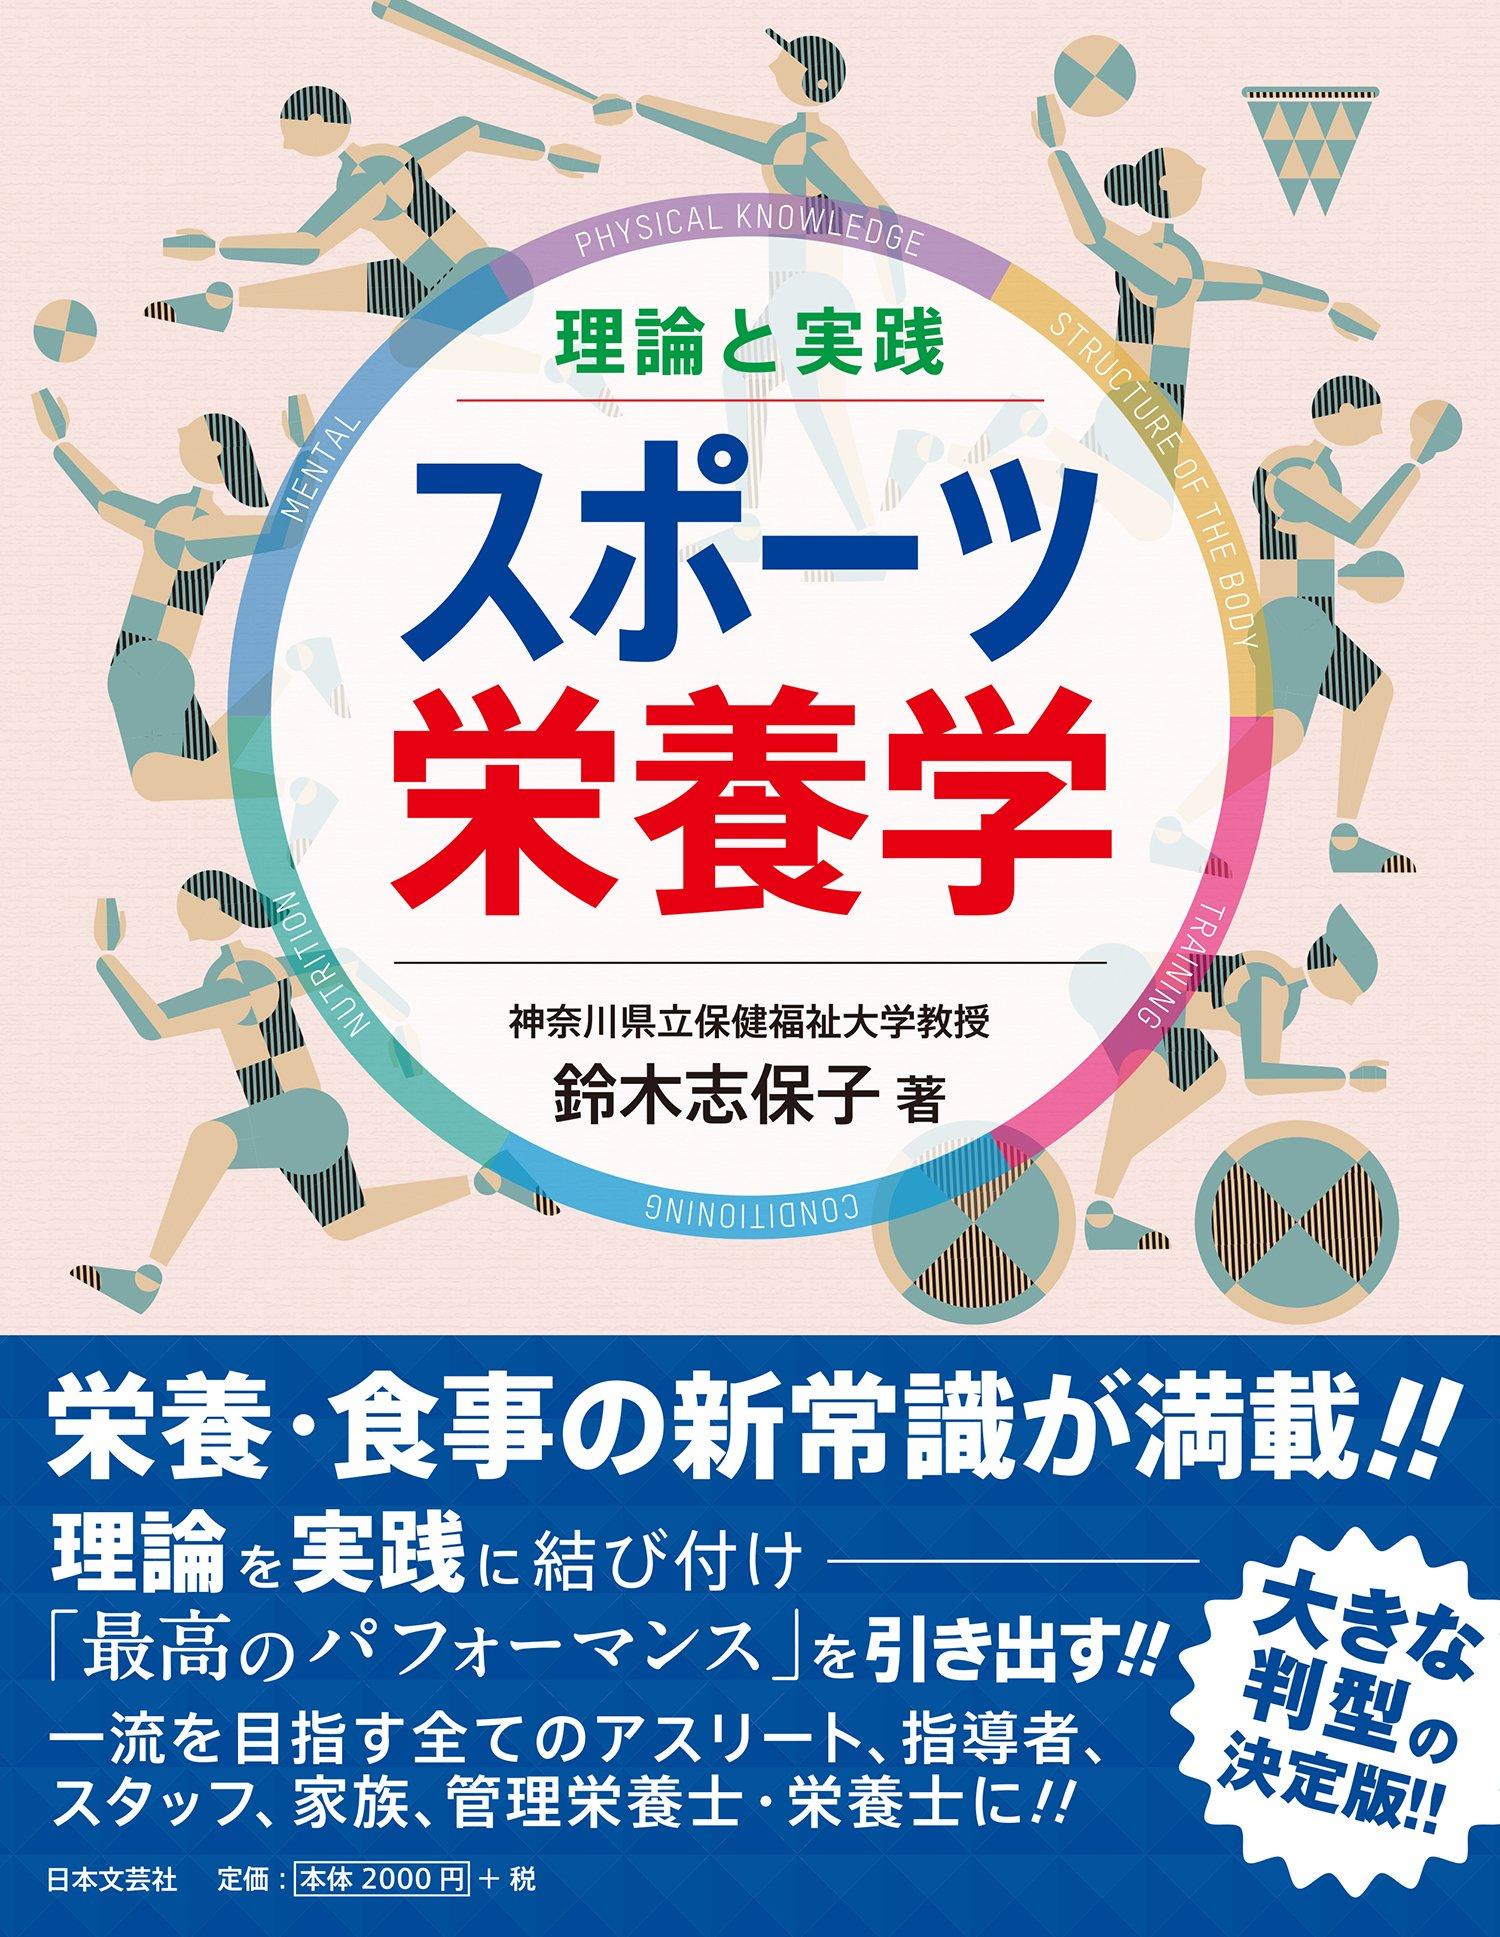 『理論と実践 スポーツ栄養学』(鈴木志保子 著、日本文芸社 刊)